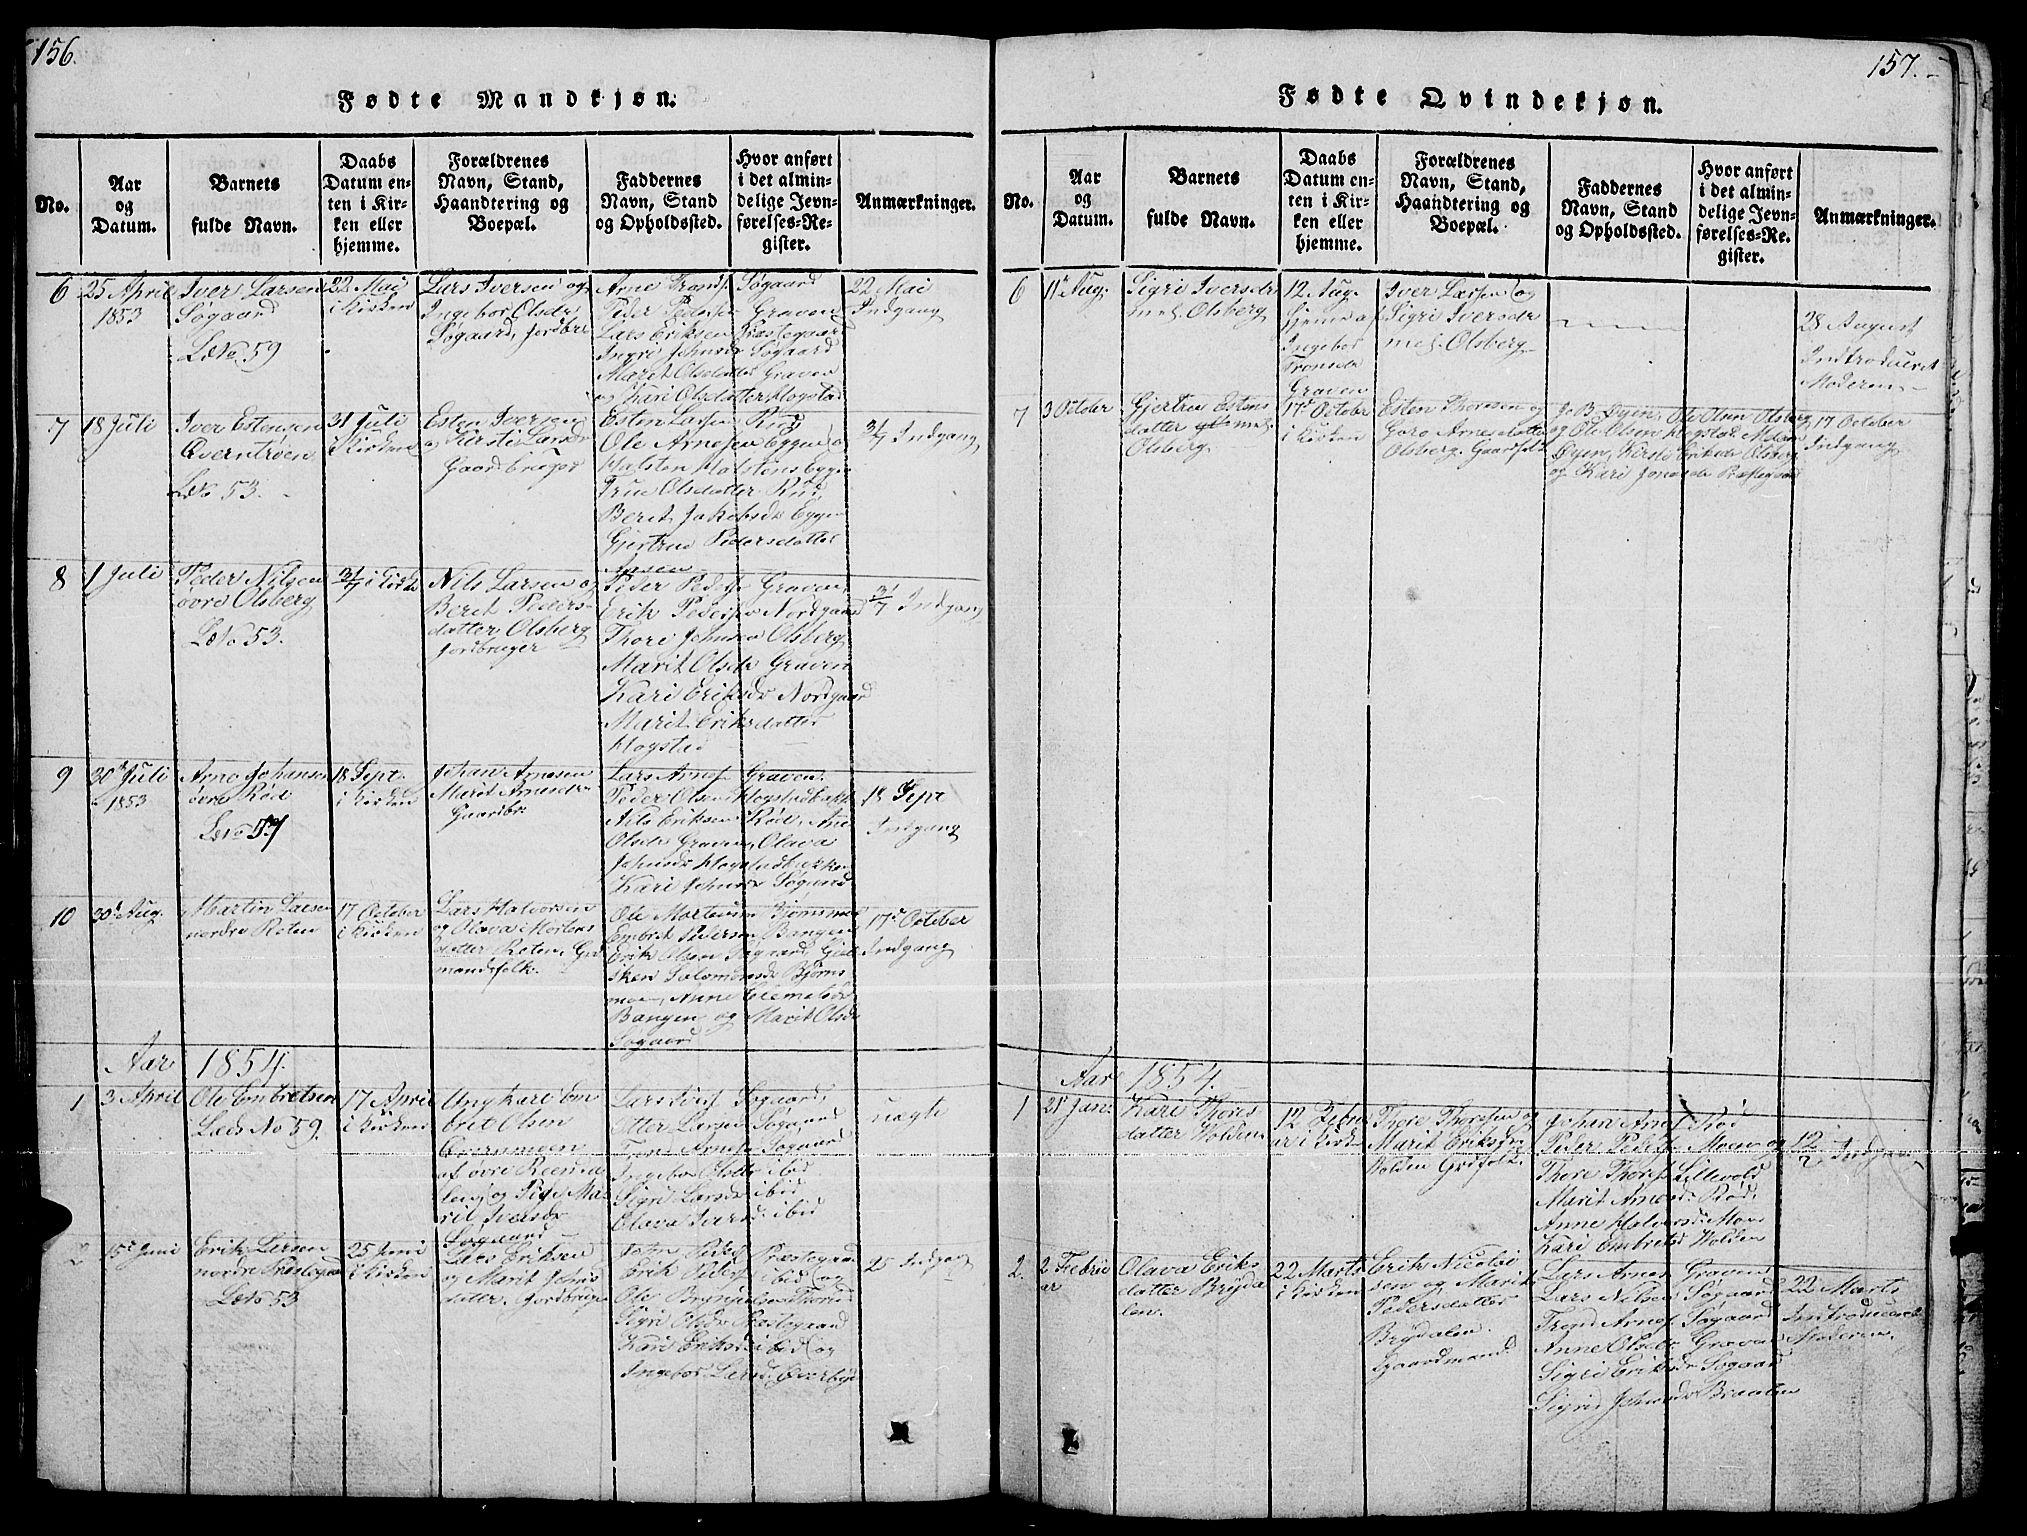 SAH, Tynset prestekontor, Klokkerbok nr. 4, 1814-1879, s. 156-157